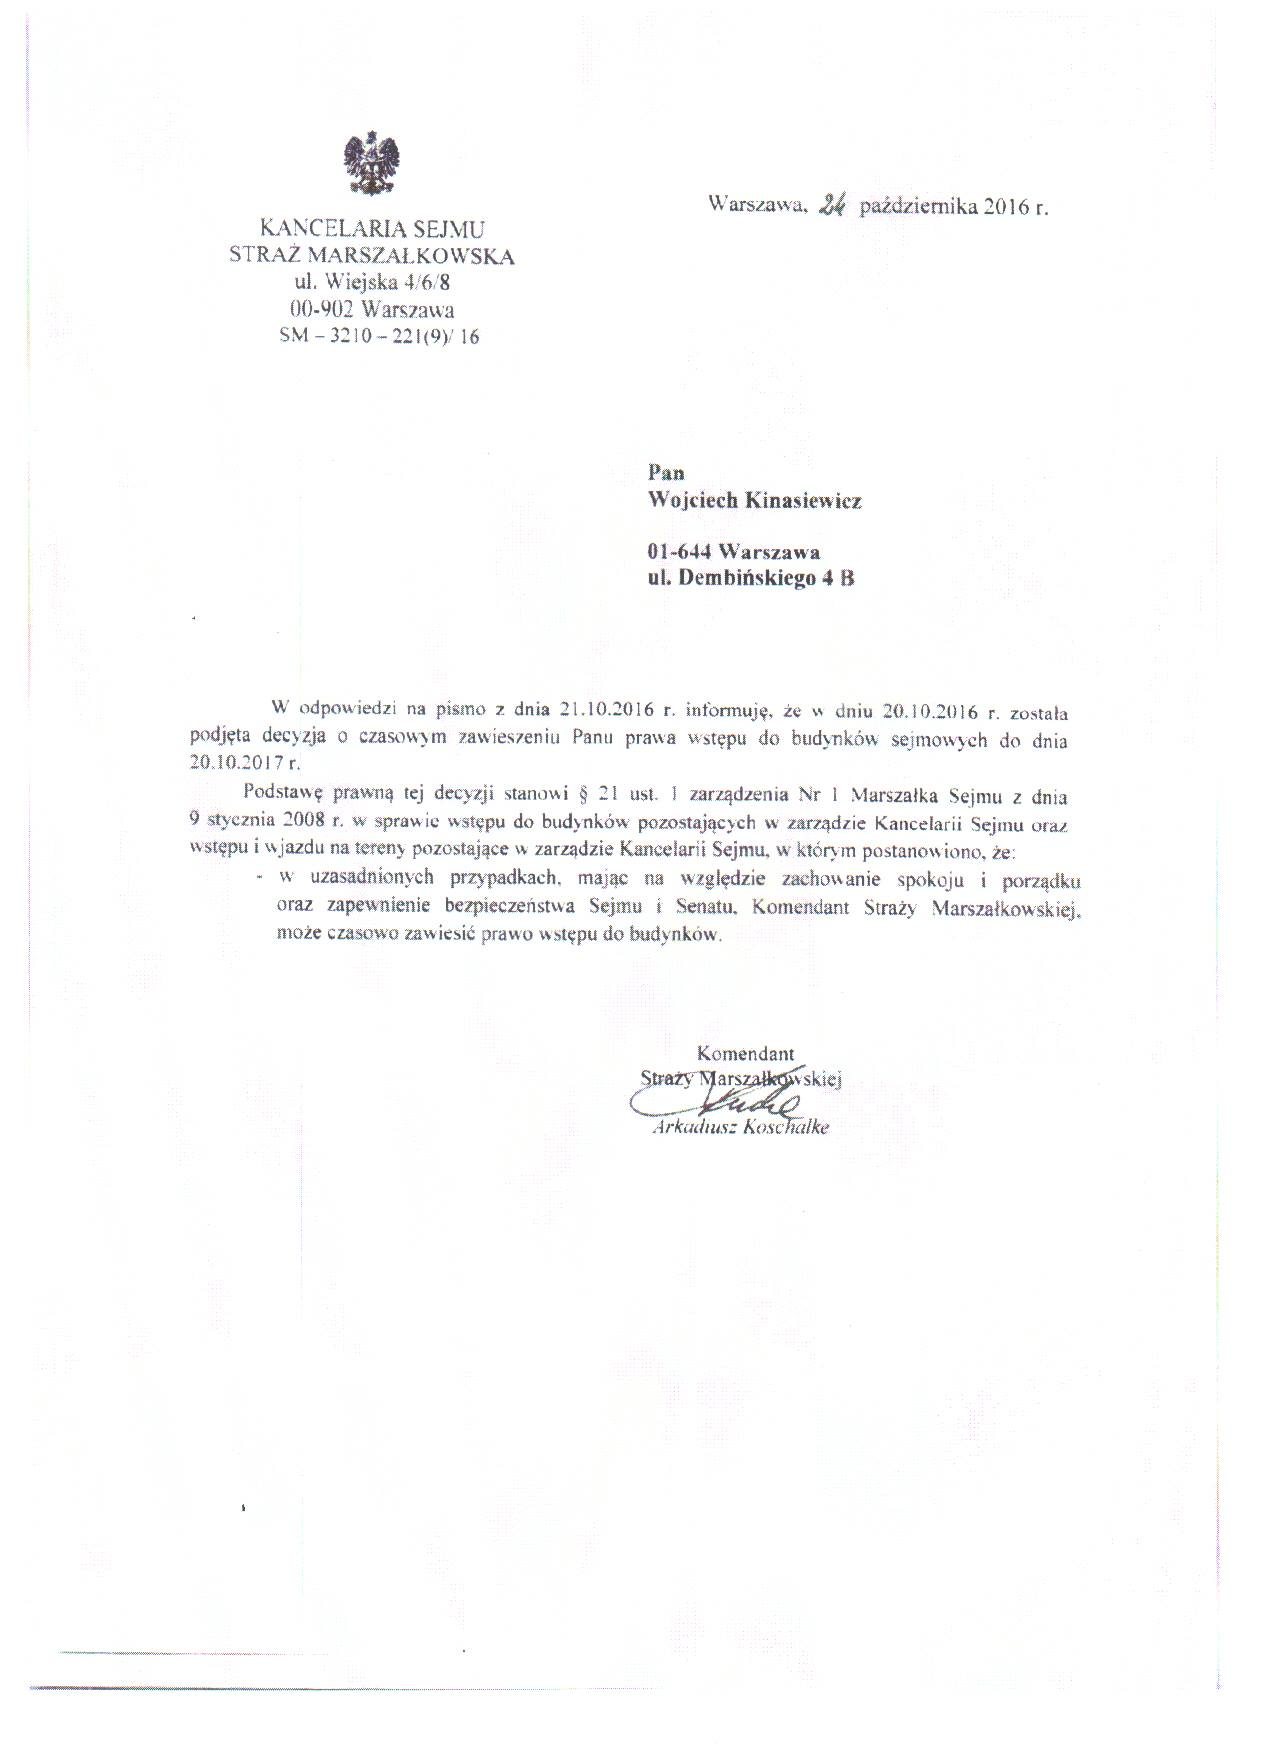 WojtekKinasiewicz